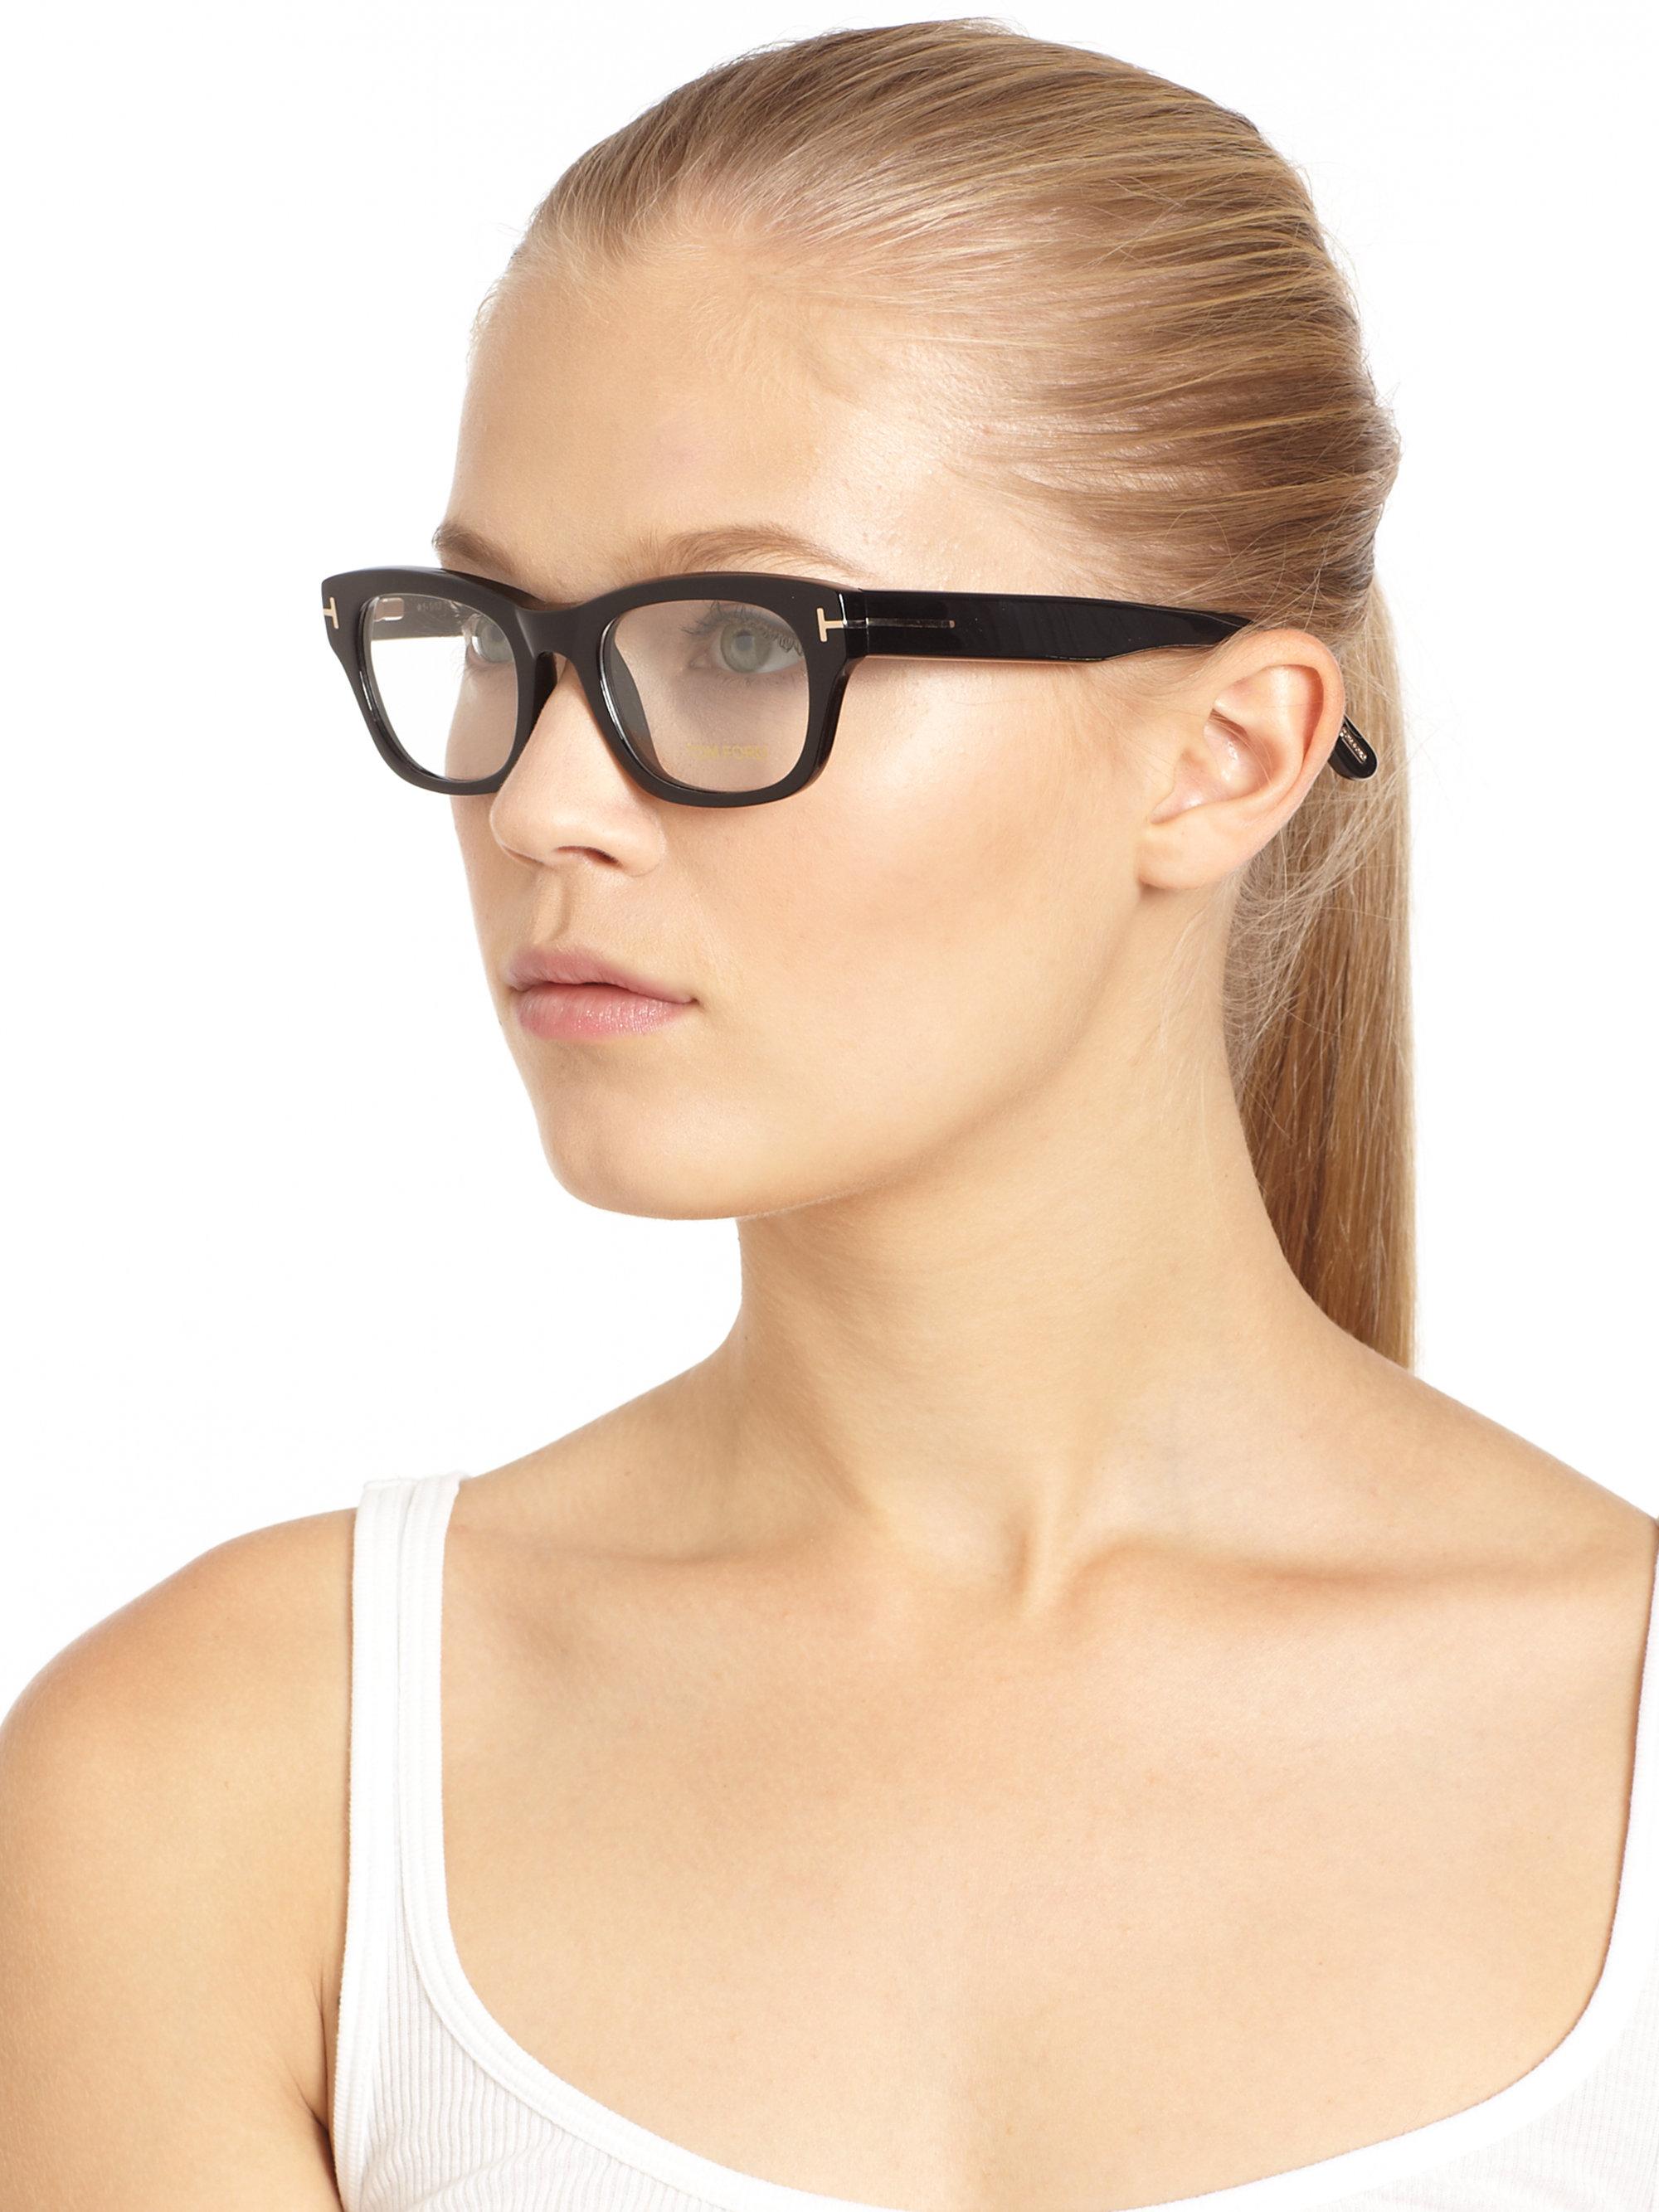 lyst tom ford thick square optical glasses black in black. Black Bedroom Furniture Sets. Home Design Ideas